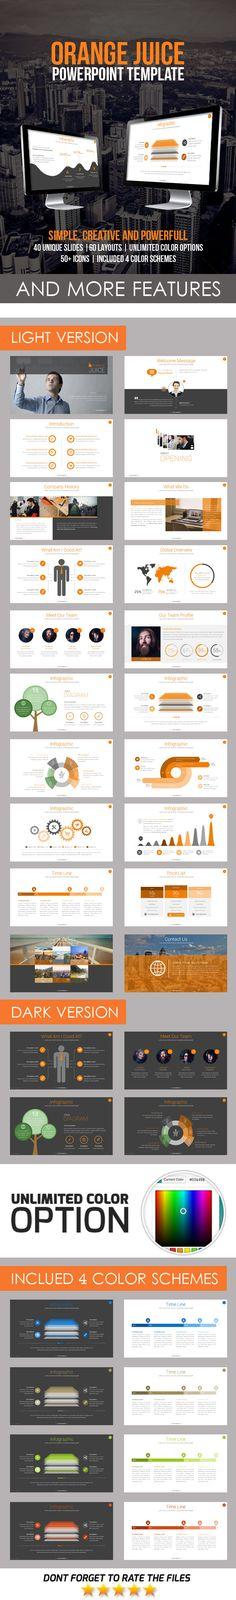 Orange Juice PowerPoint Template #design #slides Download: http://graphicriver.net/item/orange-juice-powerpoint-template/12177815?ref=ksioks